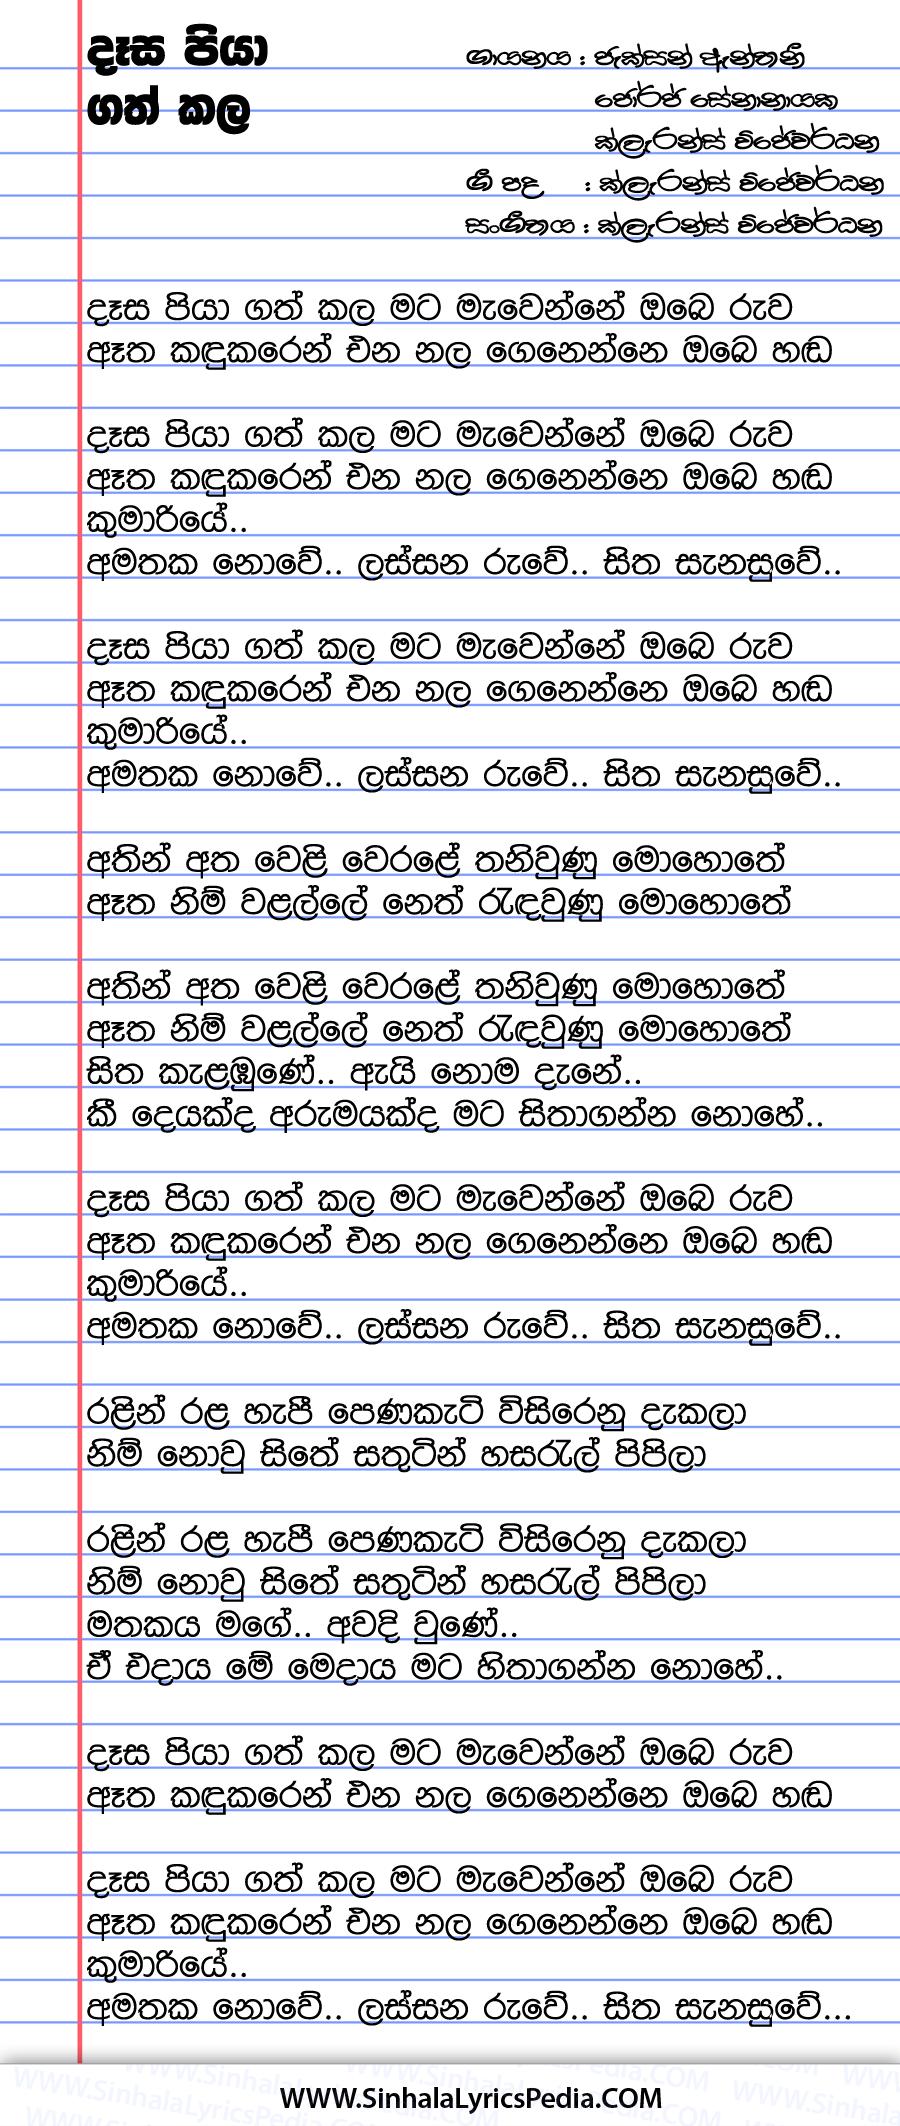 Dasa Piya Gath Kala Song Lyrics